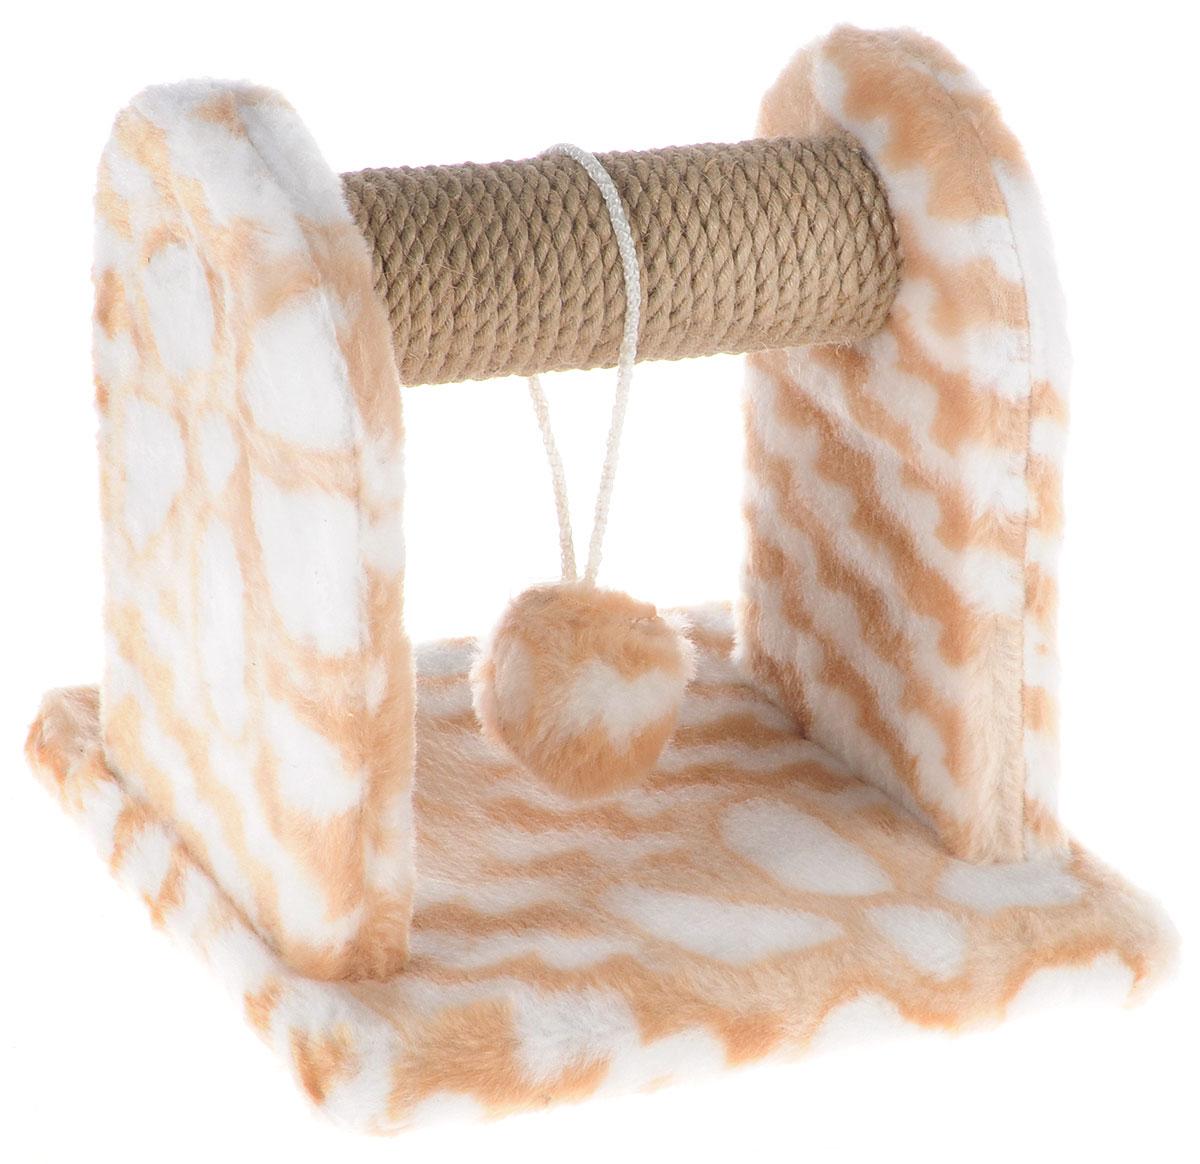 Когтеточка для котят  Меридиан , с игрушкой, цвет: белый, бежевый, 26 х 26 х 26 см